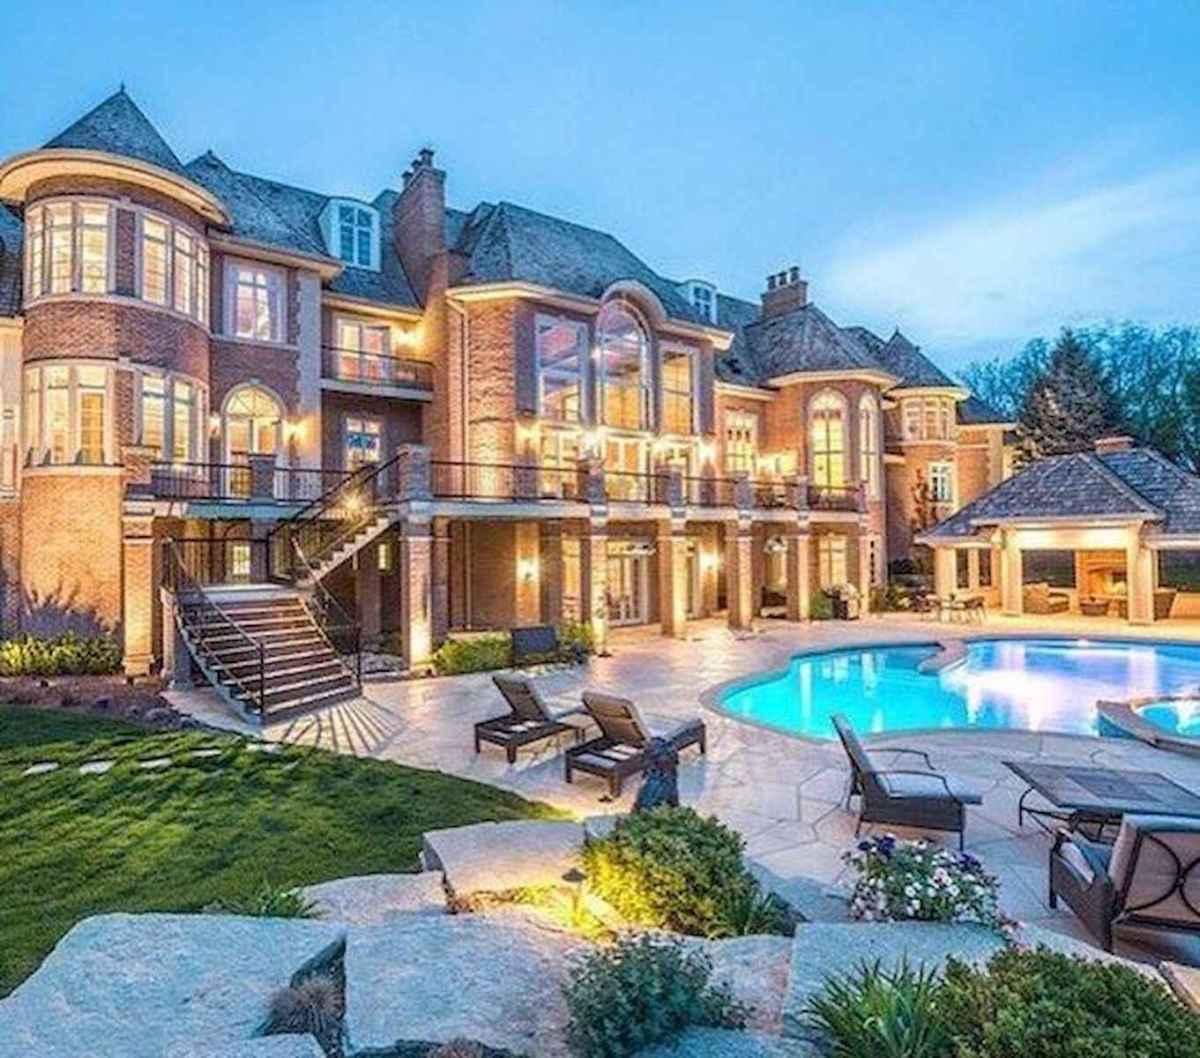 40 Stunning Mansions Luxury Exterior Design Ideas (13)